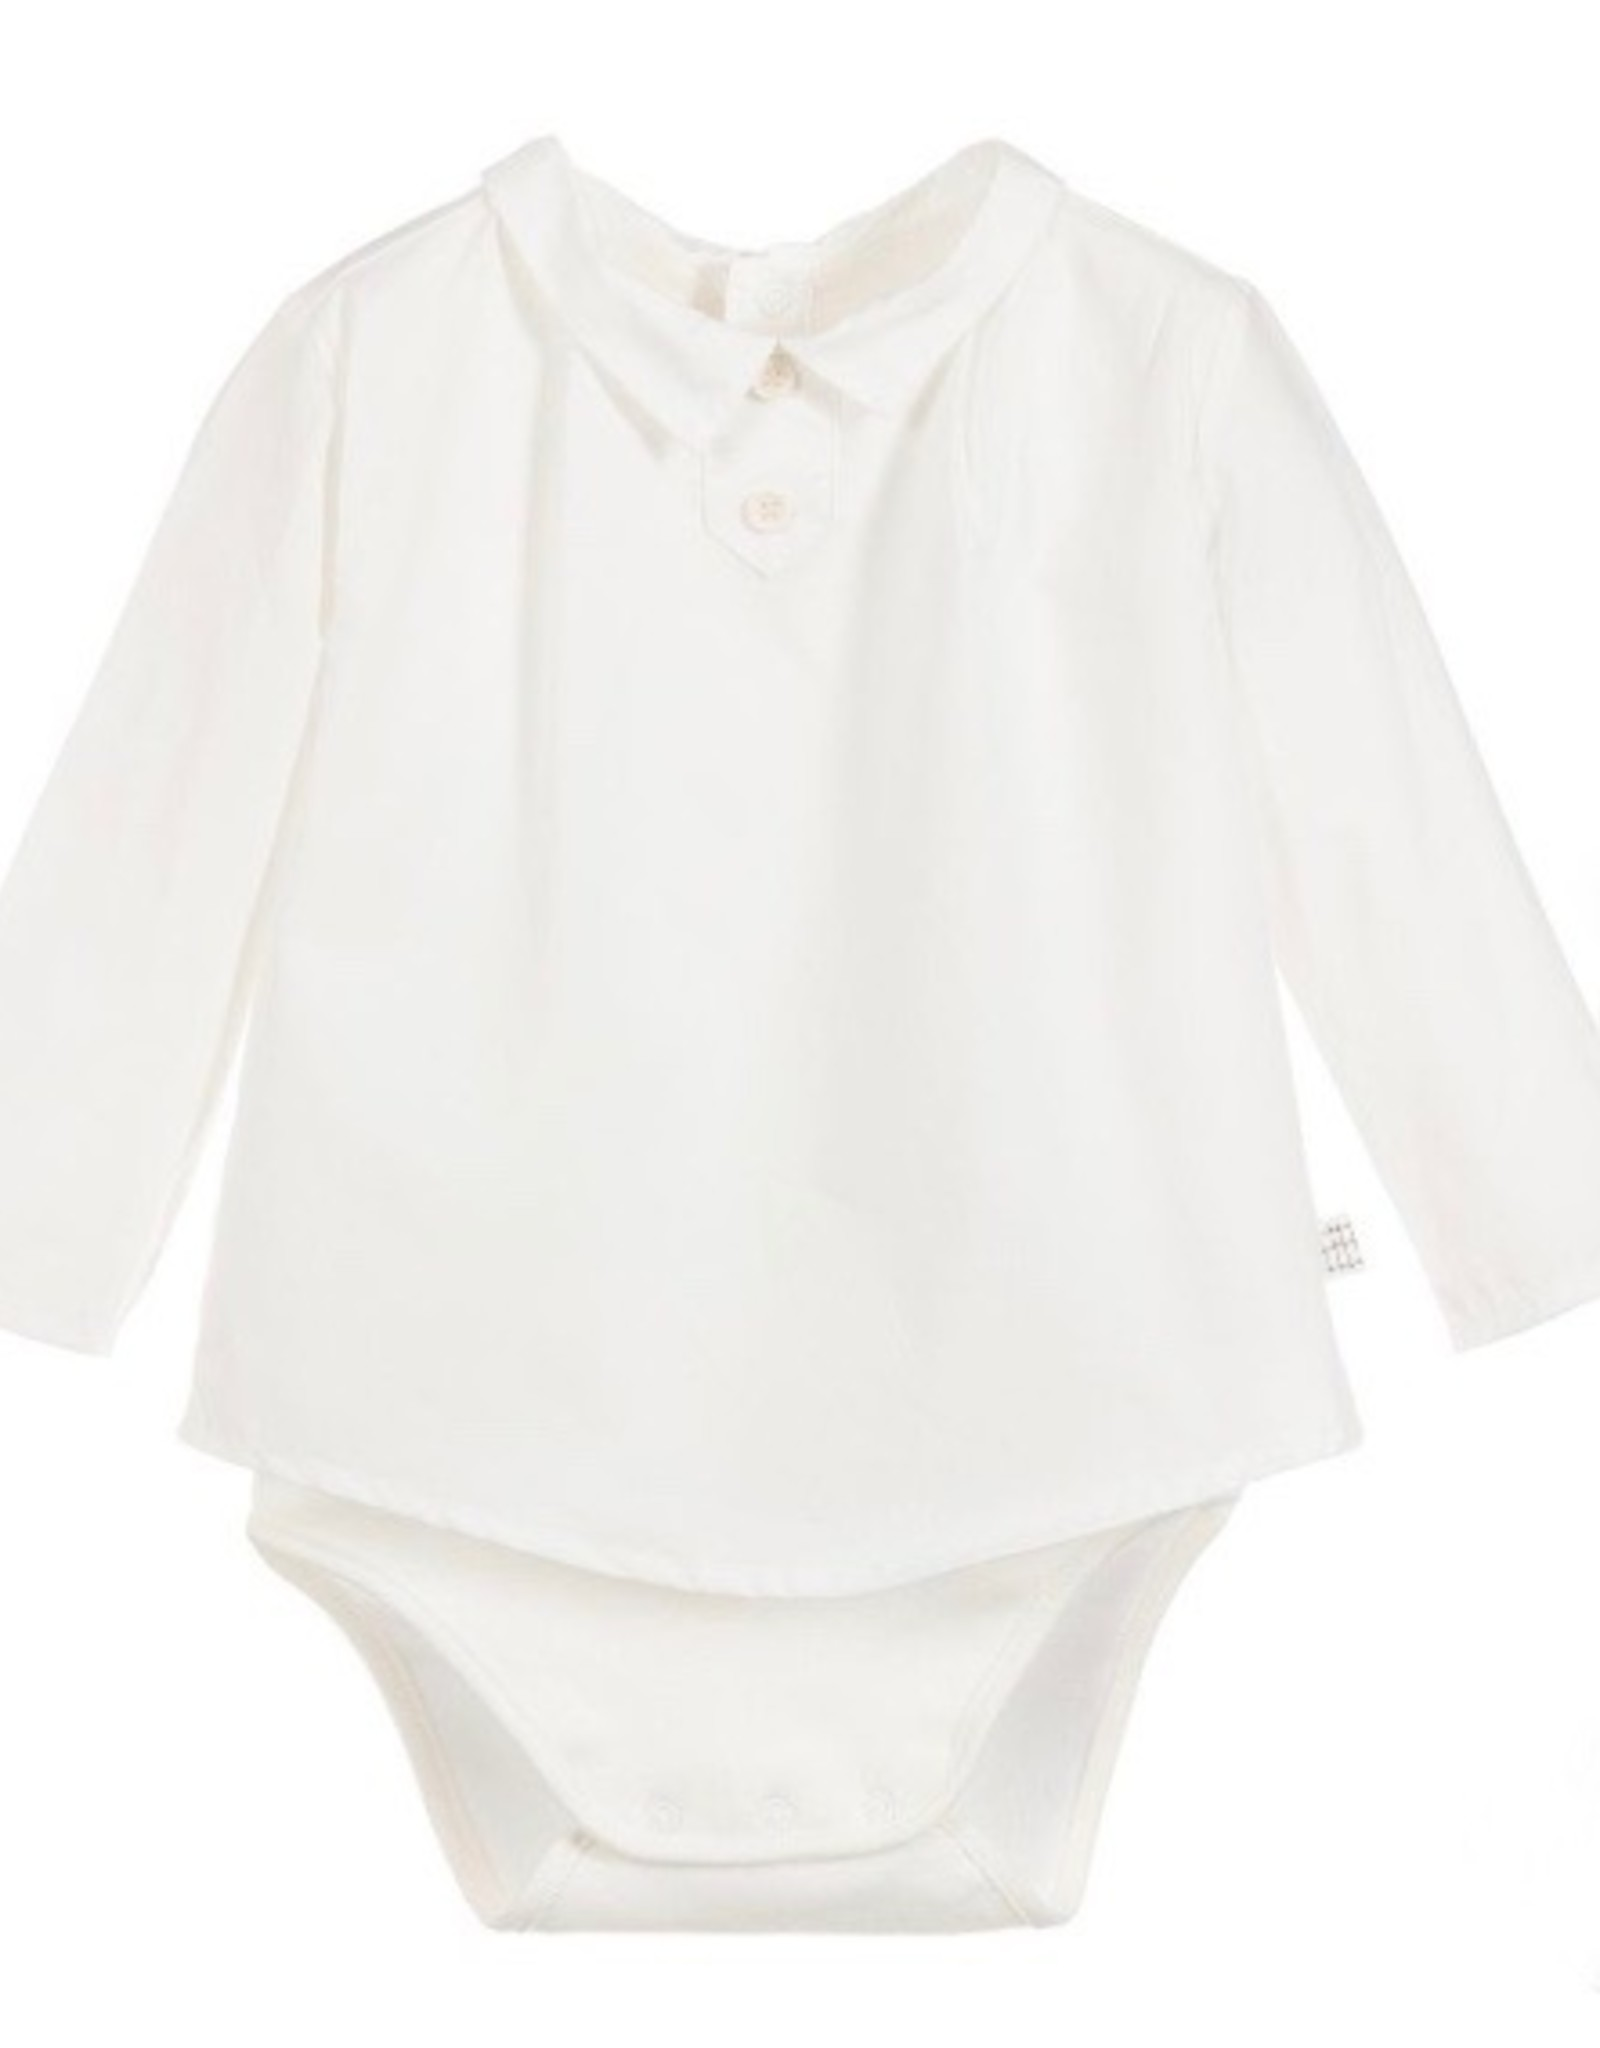 Carrément Beau Bodysuit with a shirt collar